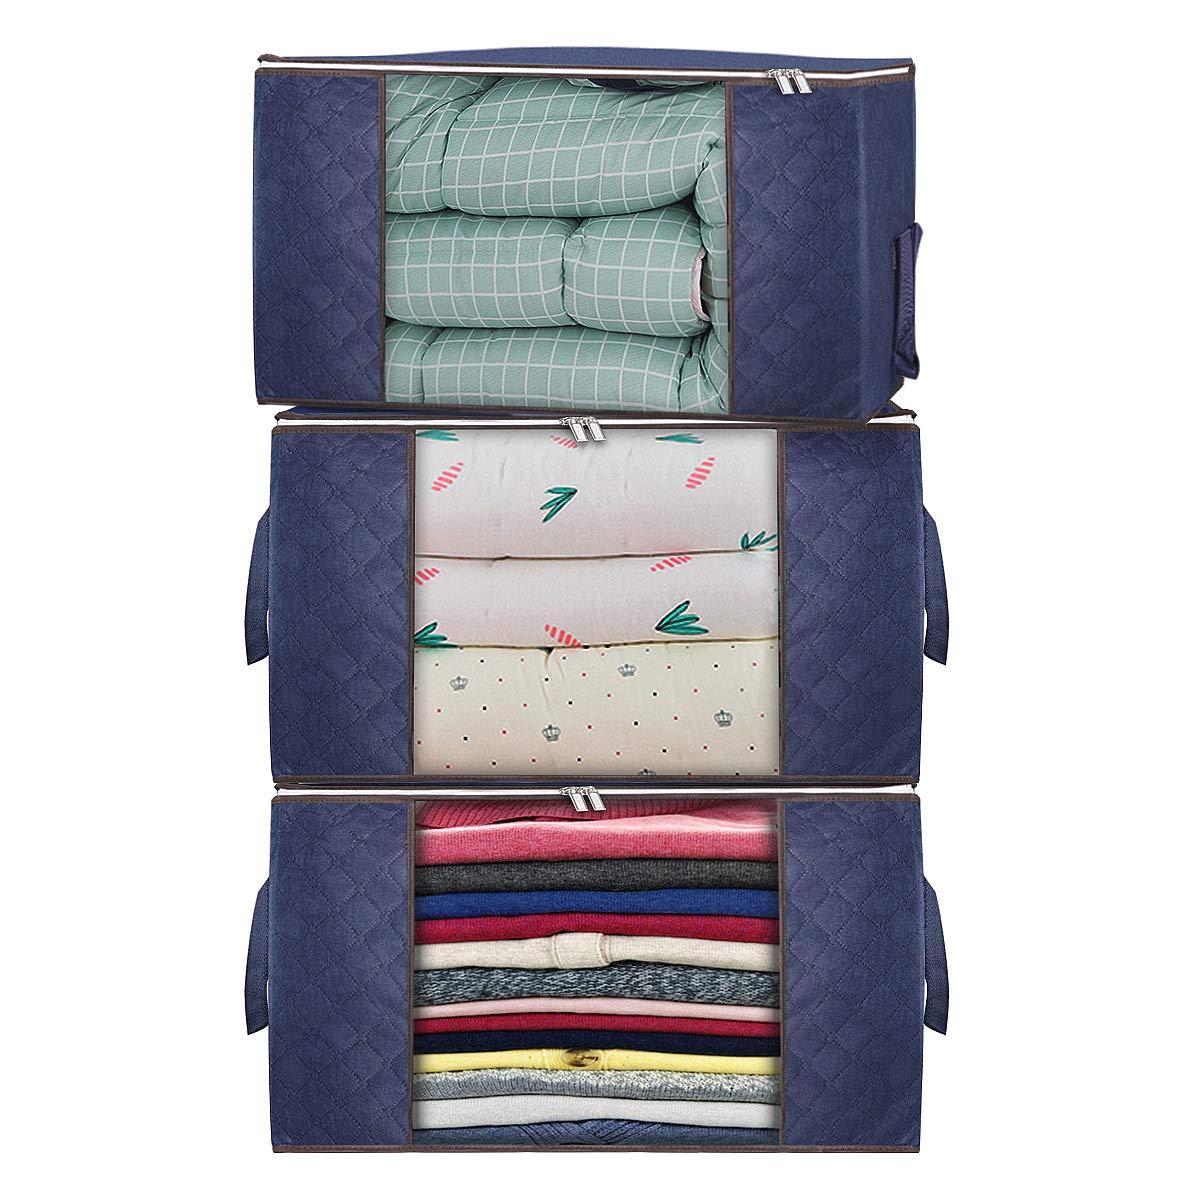 YouJiaBest Foldable Organizer Blankets Closets%EF%BC%88Blue%EF%BC%89